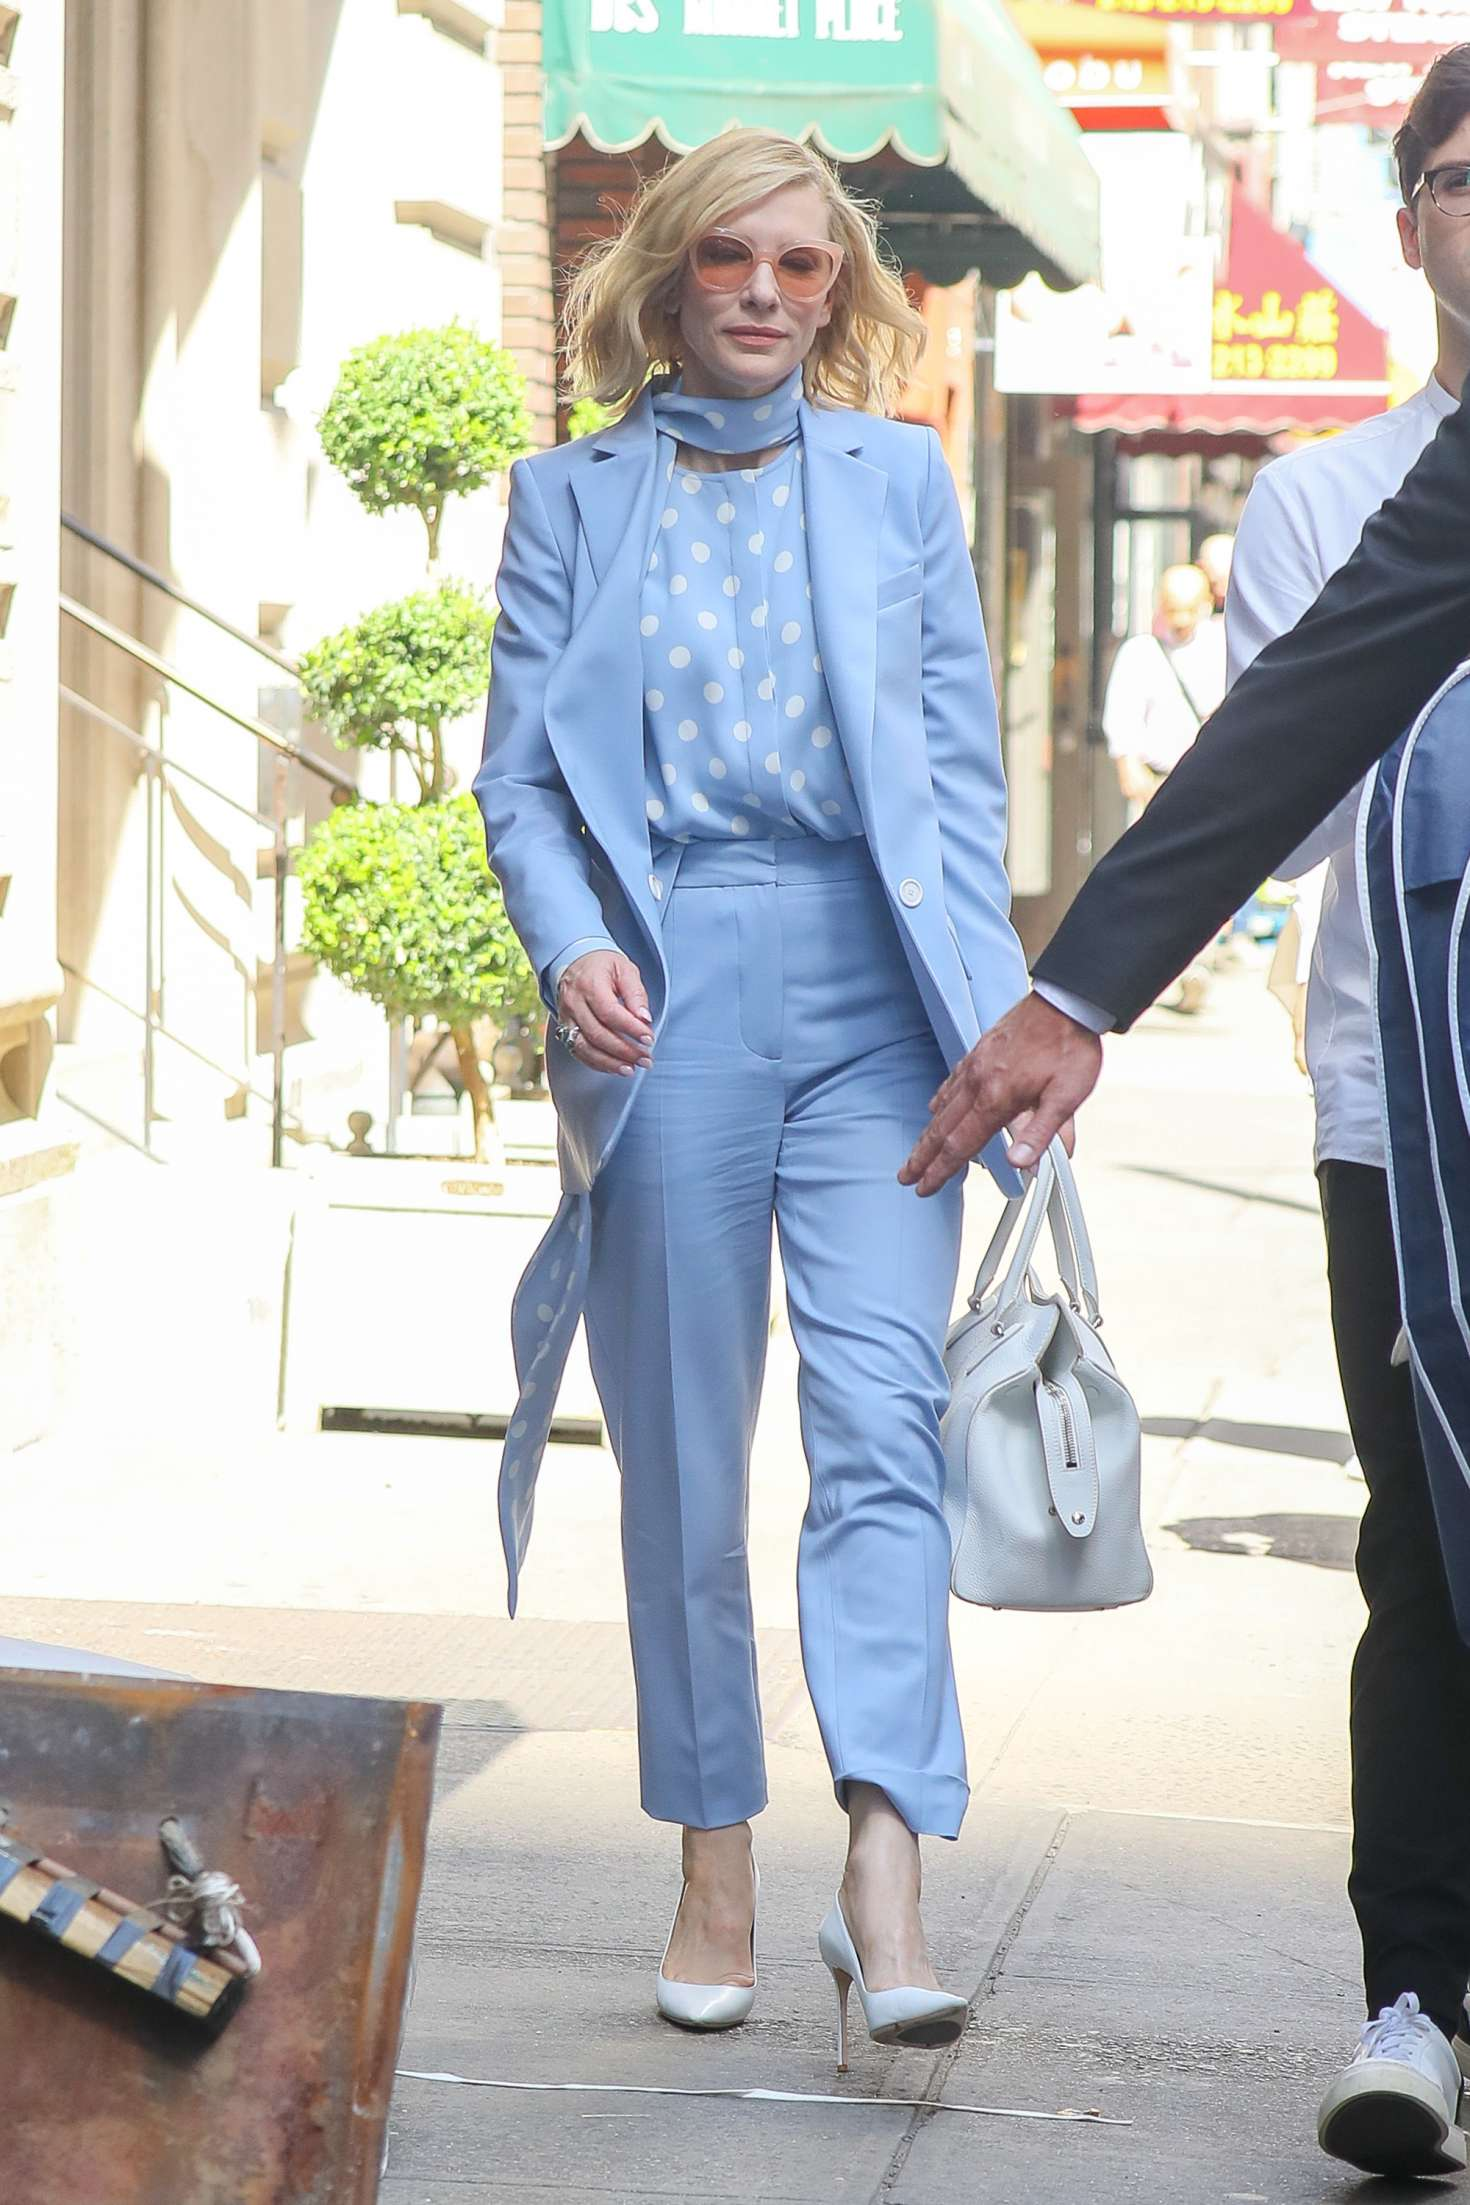 Cate Blanchett 2018 : Cate Blanchett in Light Blue outfit -01